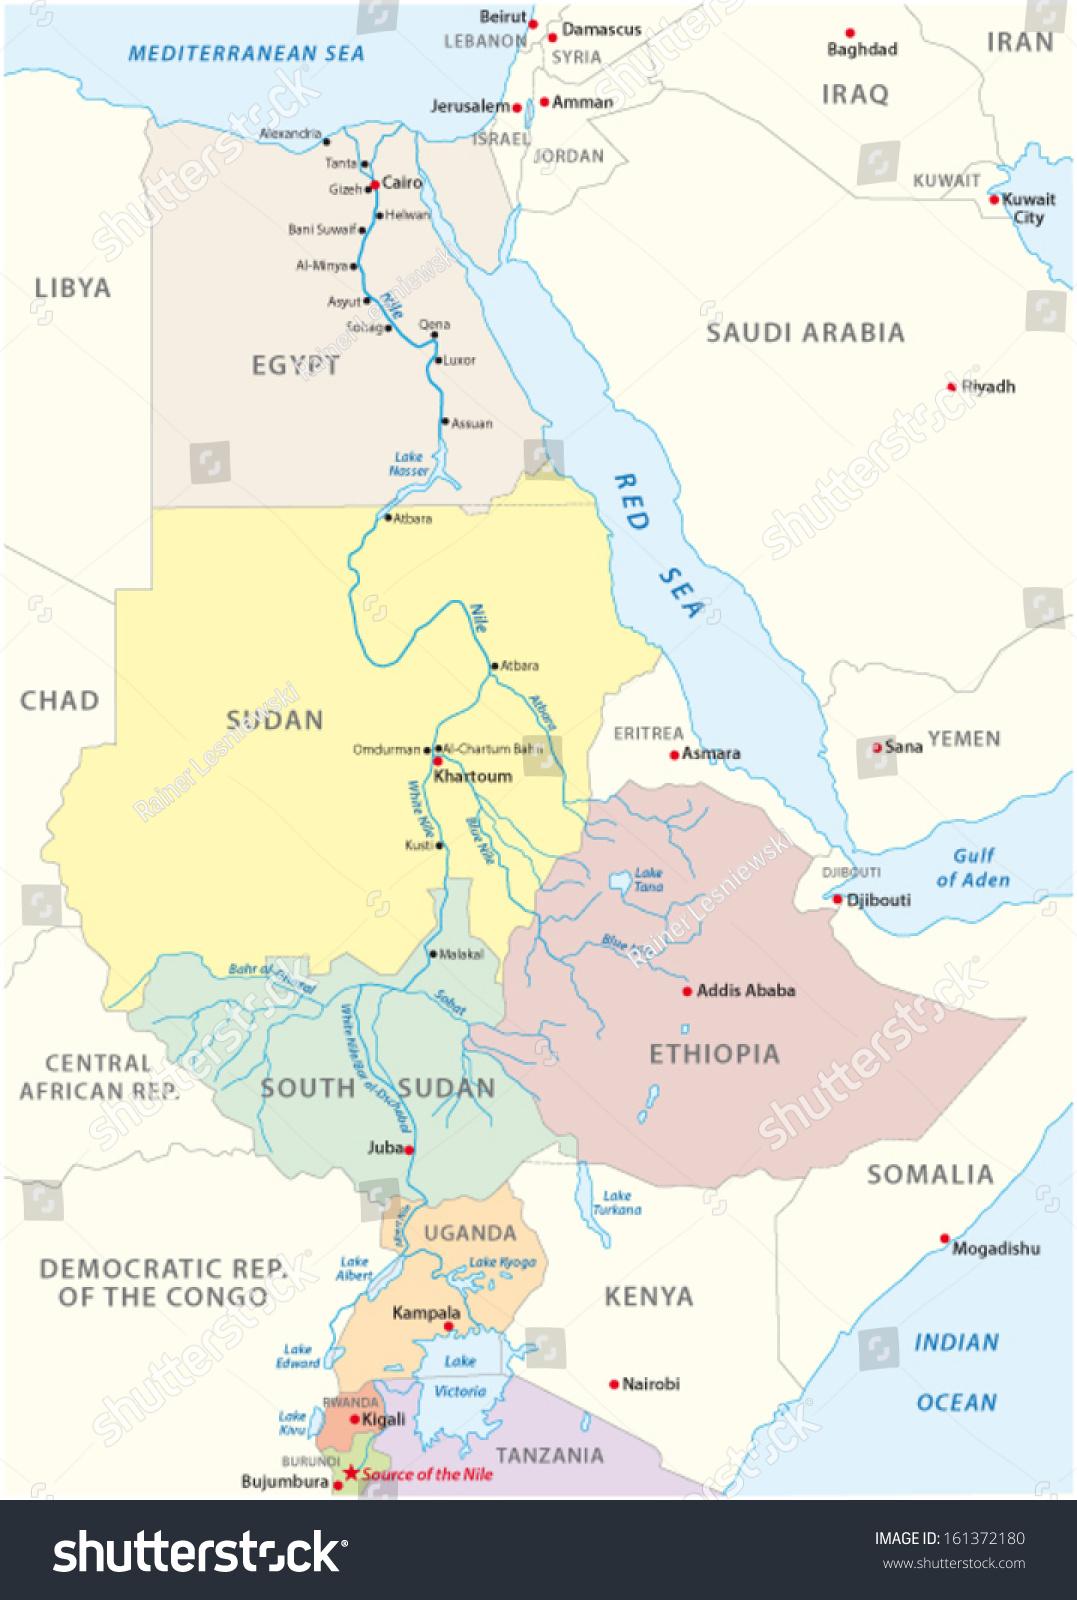 Nile River Map Stock Vector Shutterstock - Map of egypt nile